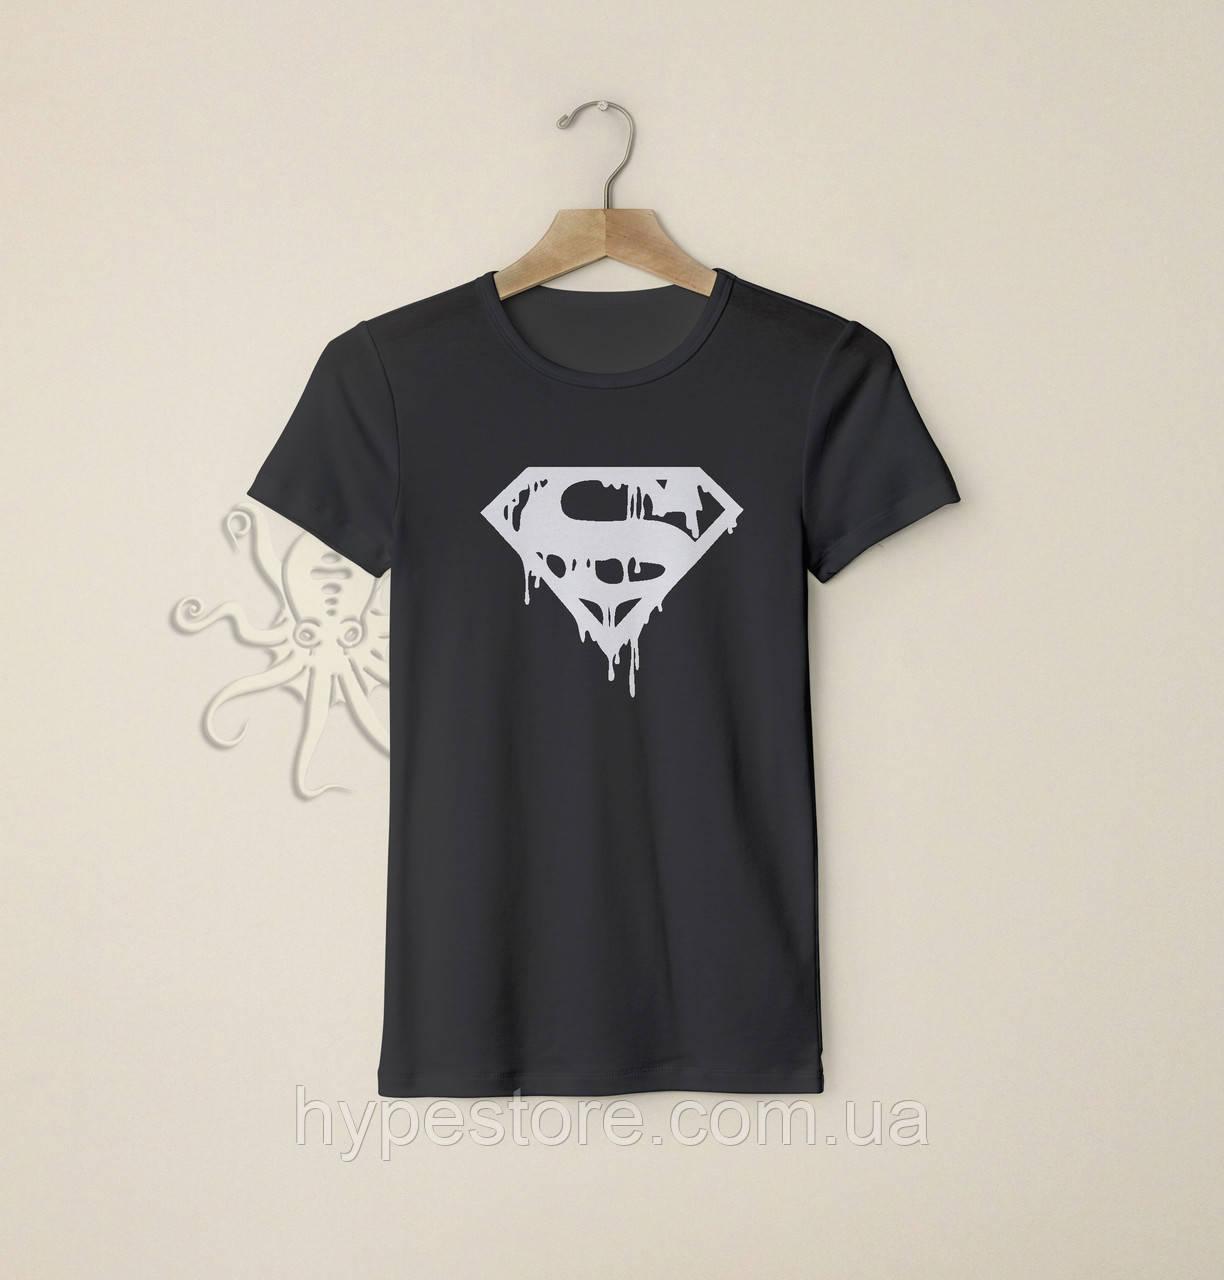 Мужская черная футболка, чоловіча футболка Superman (белый лого), Реплика